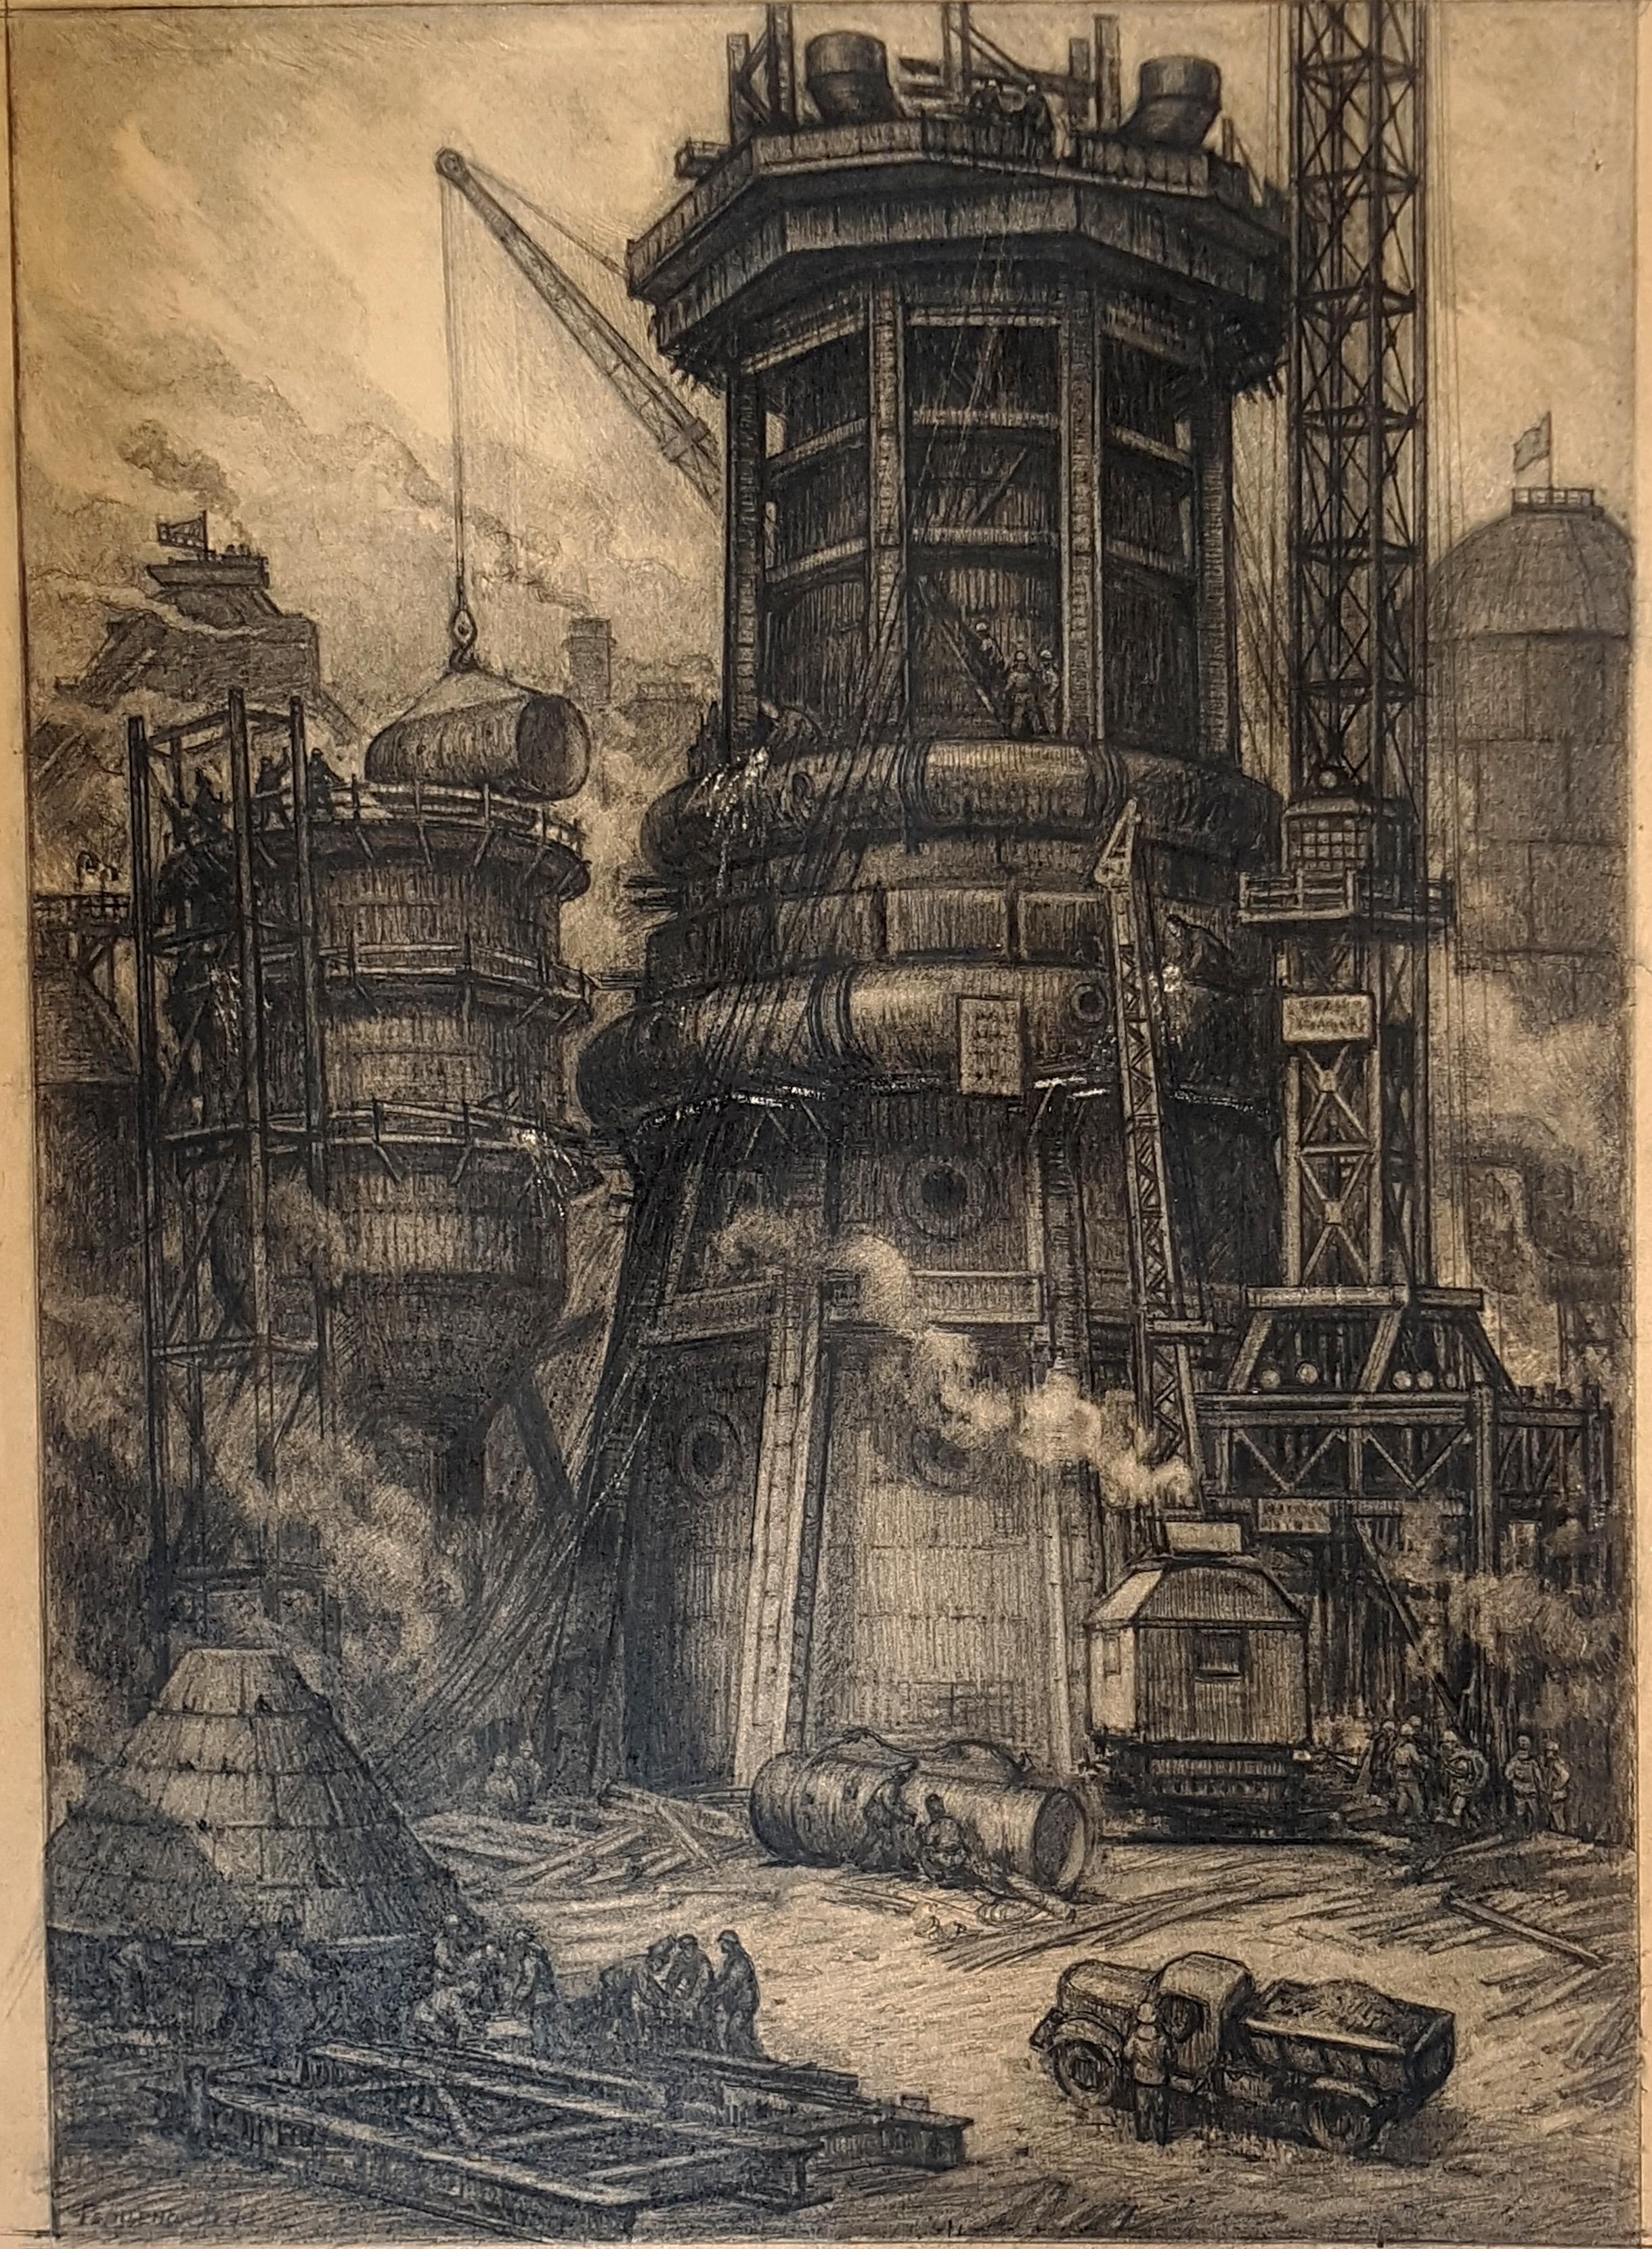 Construction of blast furnace